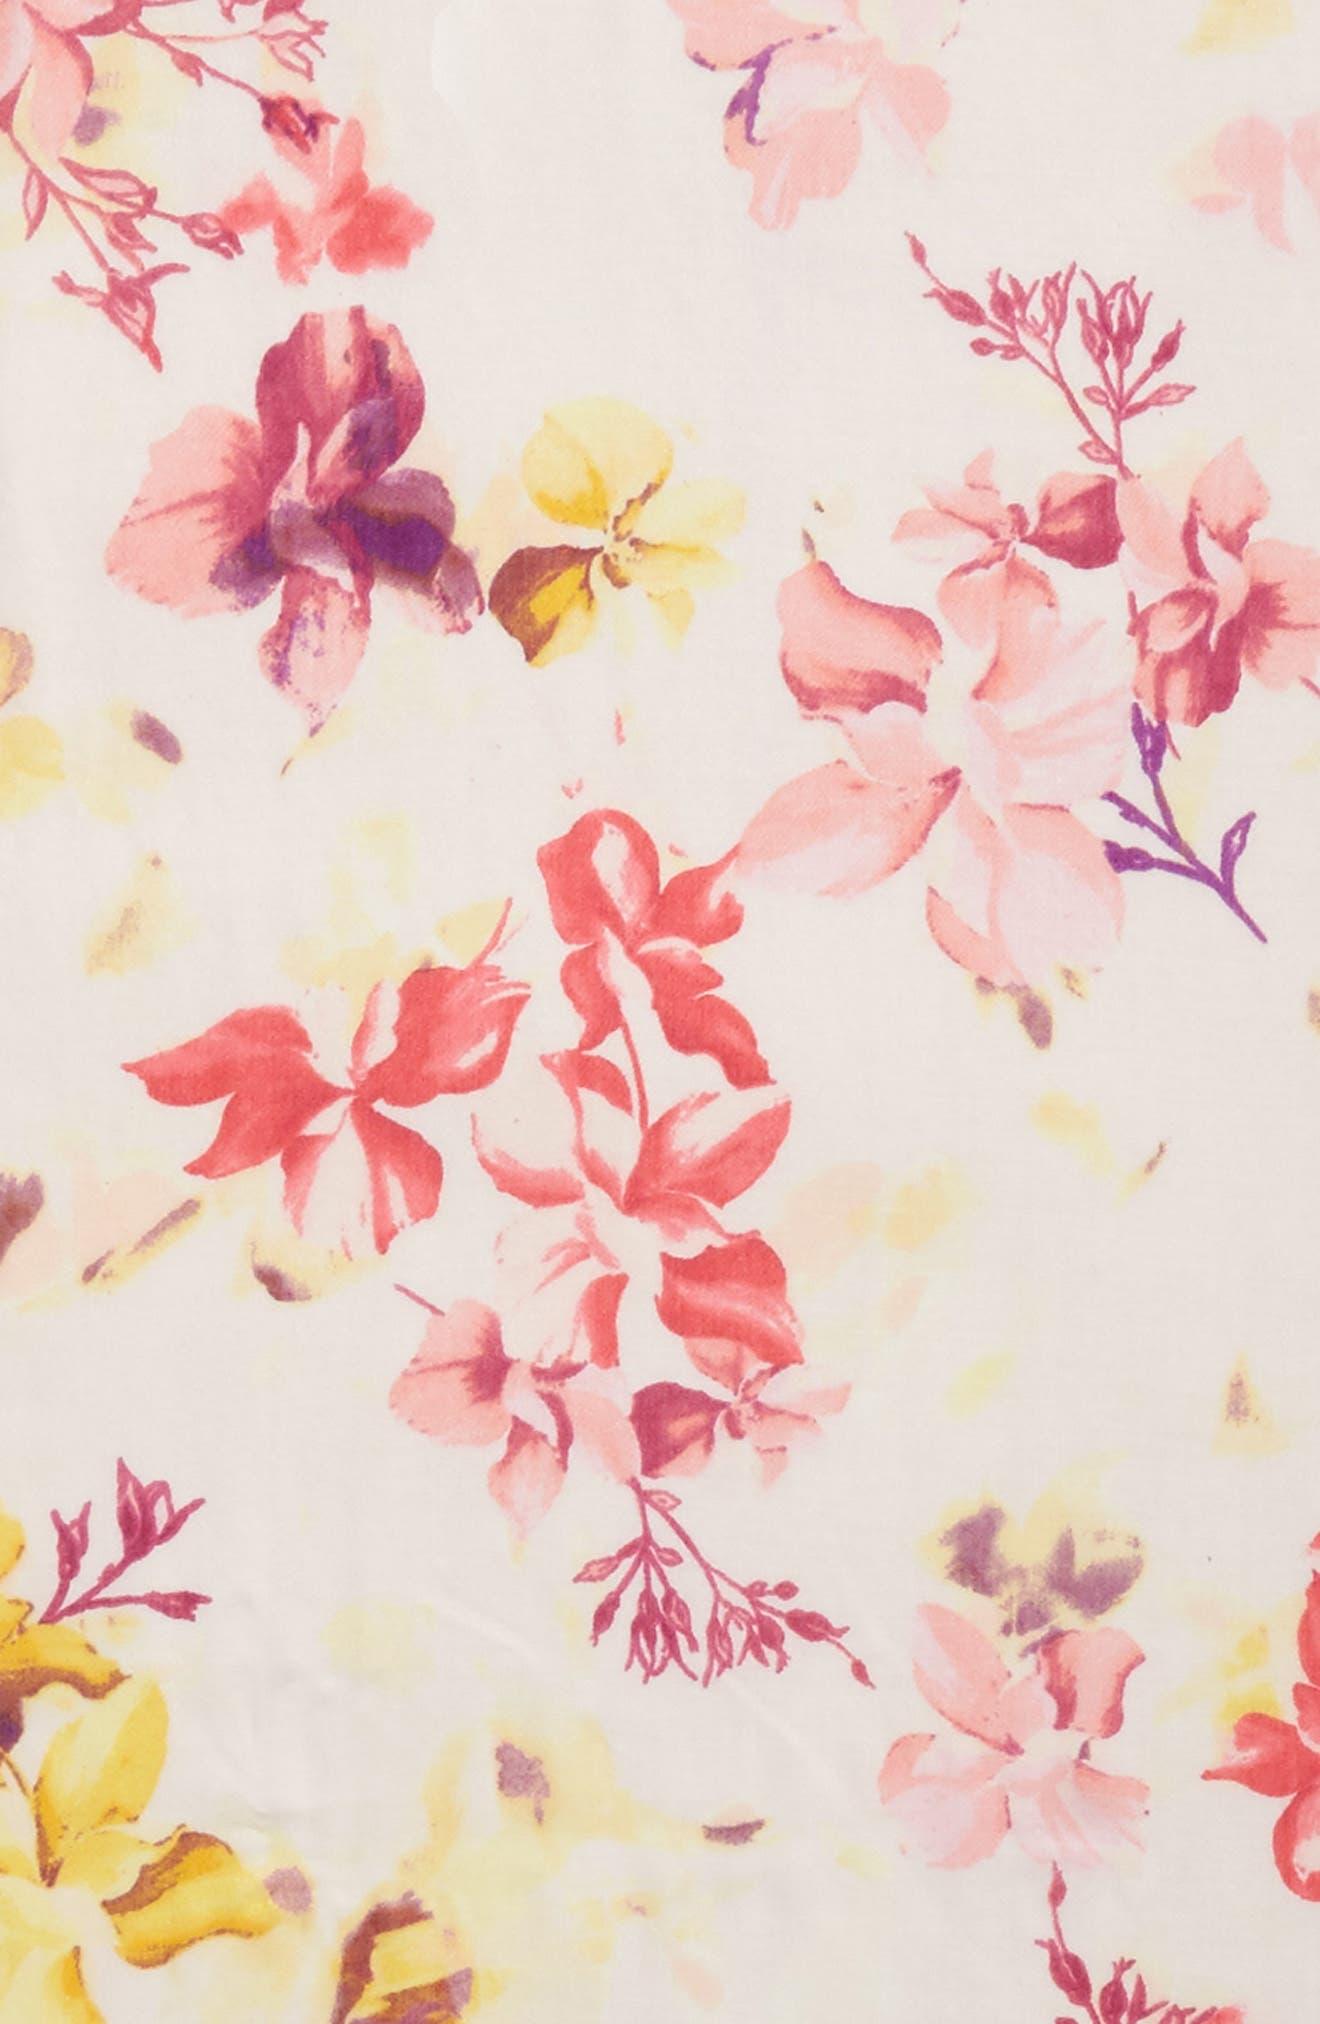 Eyelash Trim Print Cashmere & Silk Wrap,                             Alternate thumbnail 4, color,                             Pink Frosted Petals